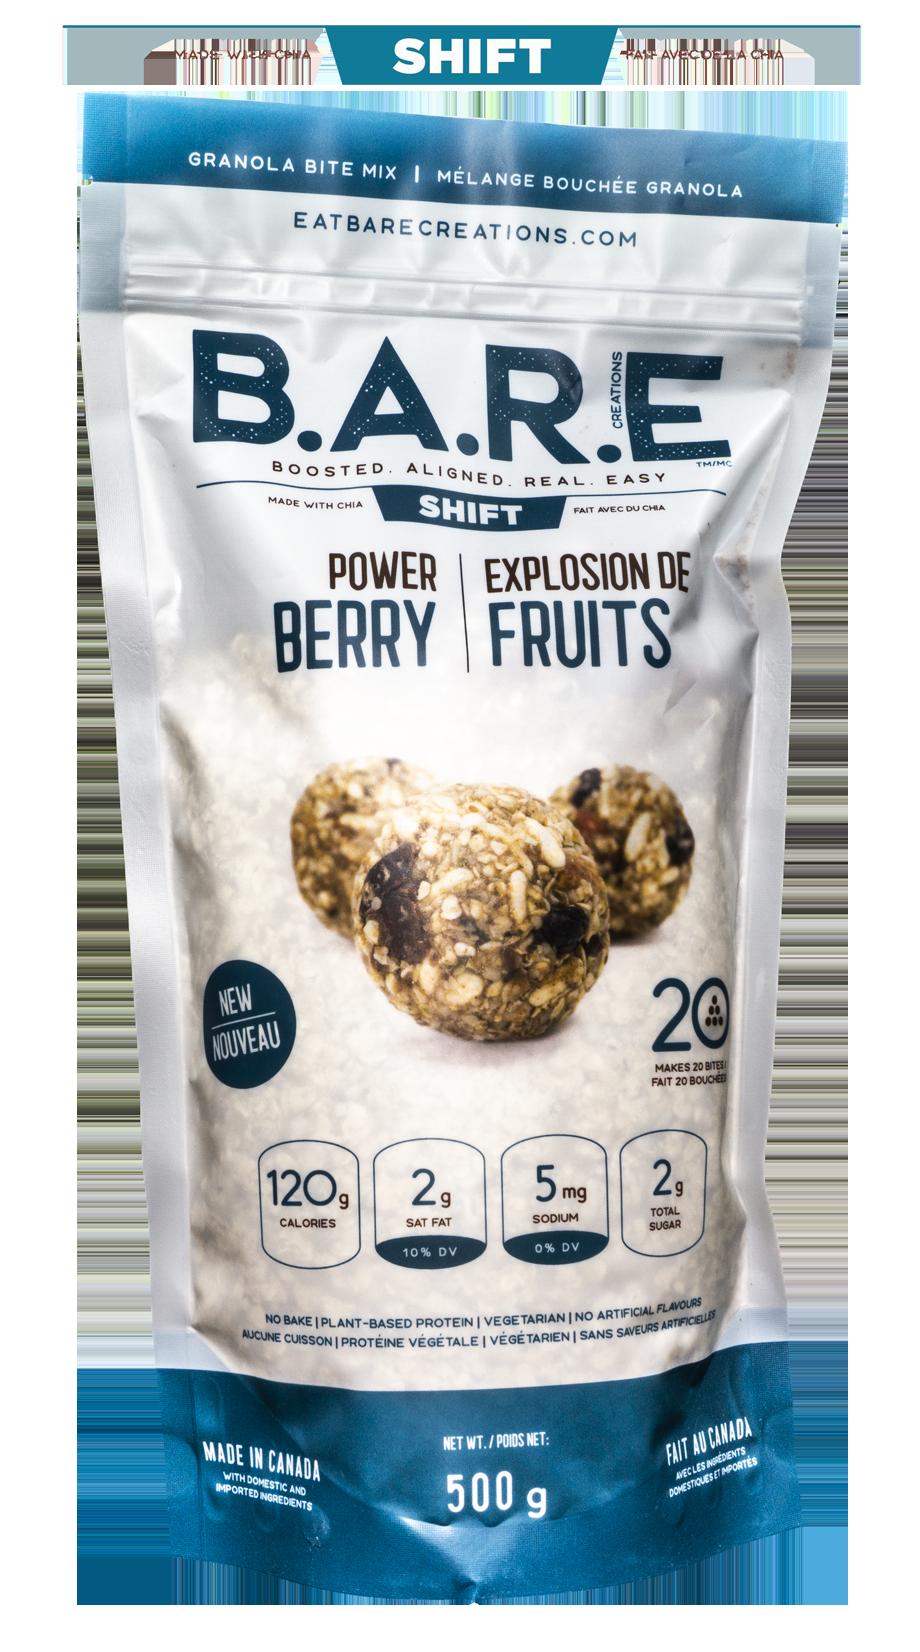 Power Berry Chia Granola Bite Bar Mix